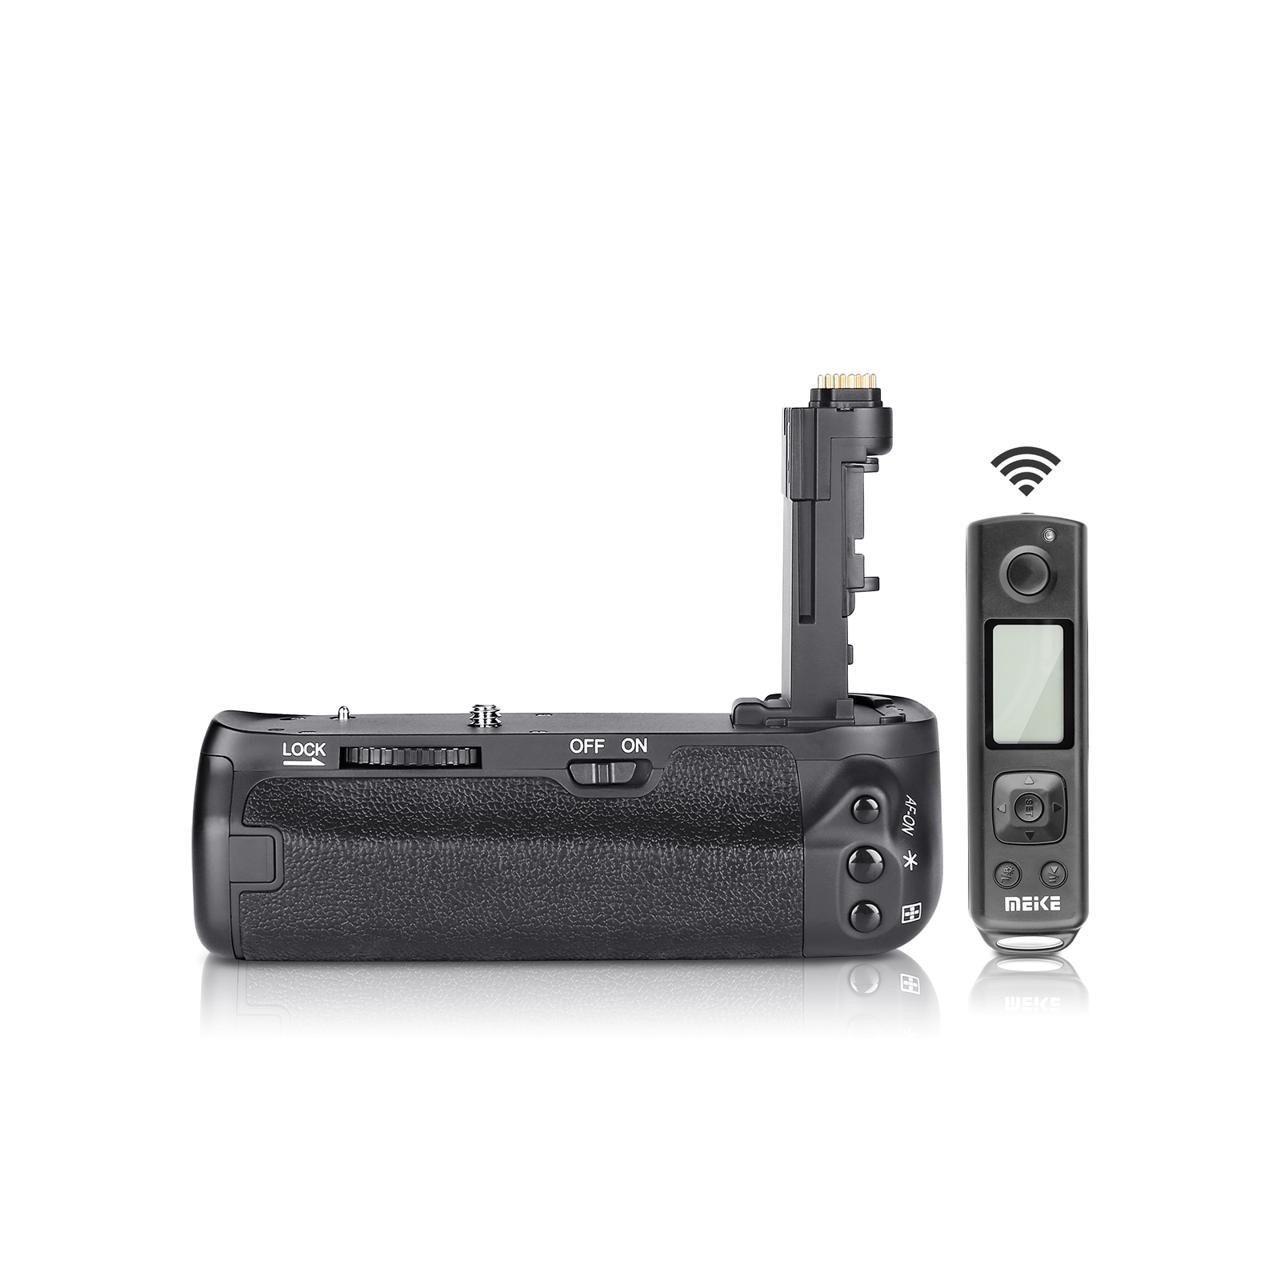 Meike MK-6DII Pro Battery Grip Built-in 2.4G Remote Control for Canon 6D Mark II As BG-E21 meike mk 760d pro built in 2 4g wireless control battery grip suit for canon 750d 760d as bg e18